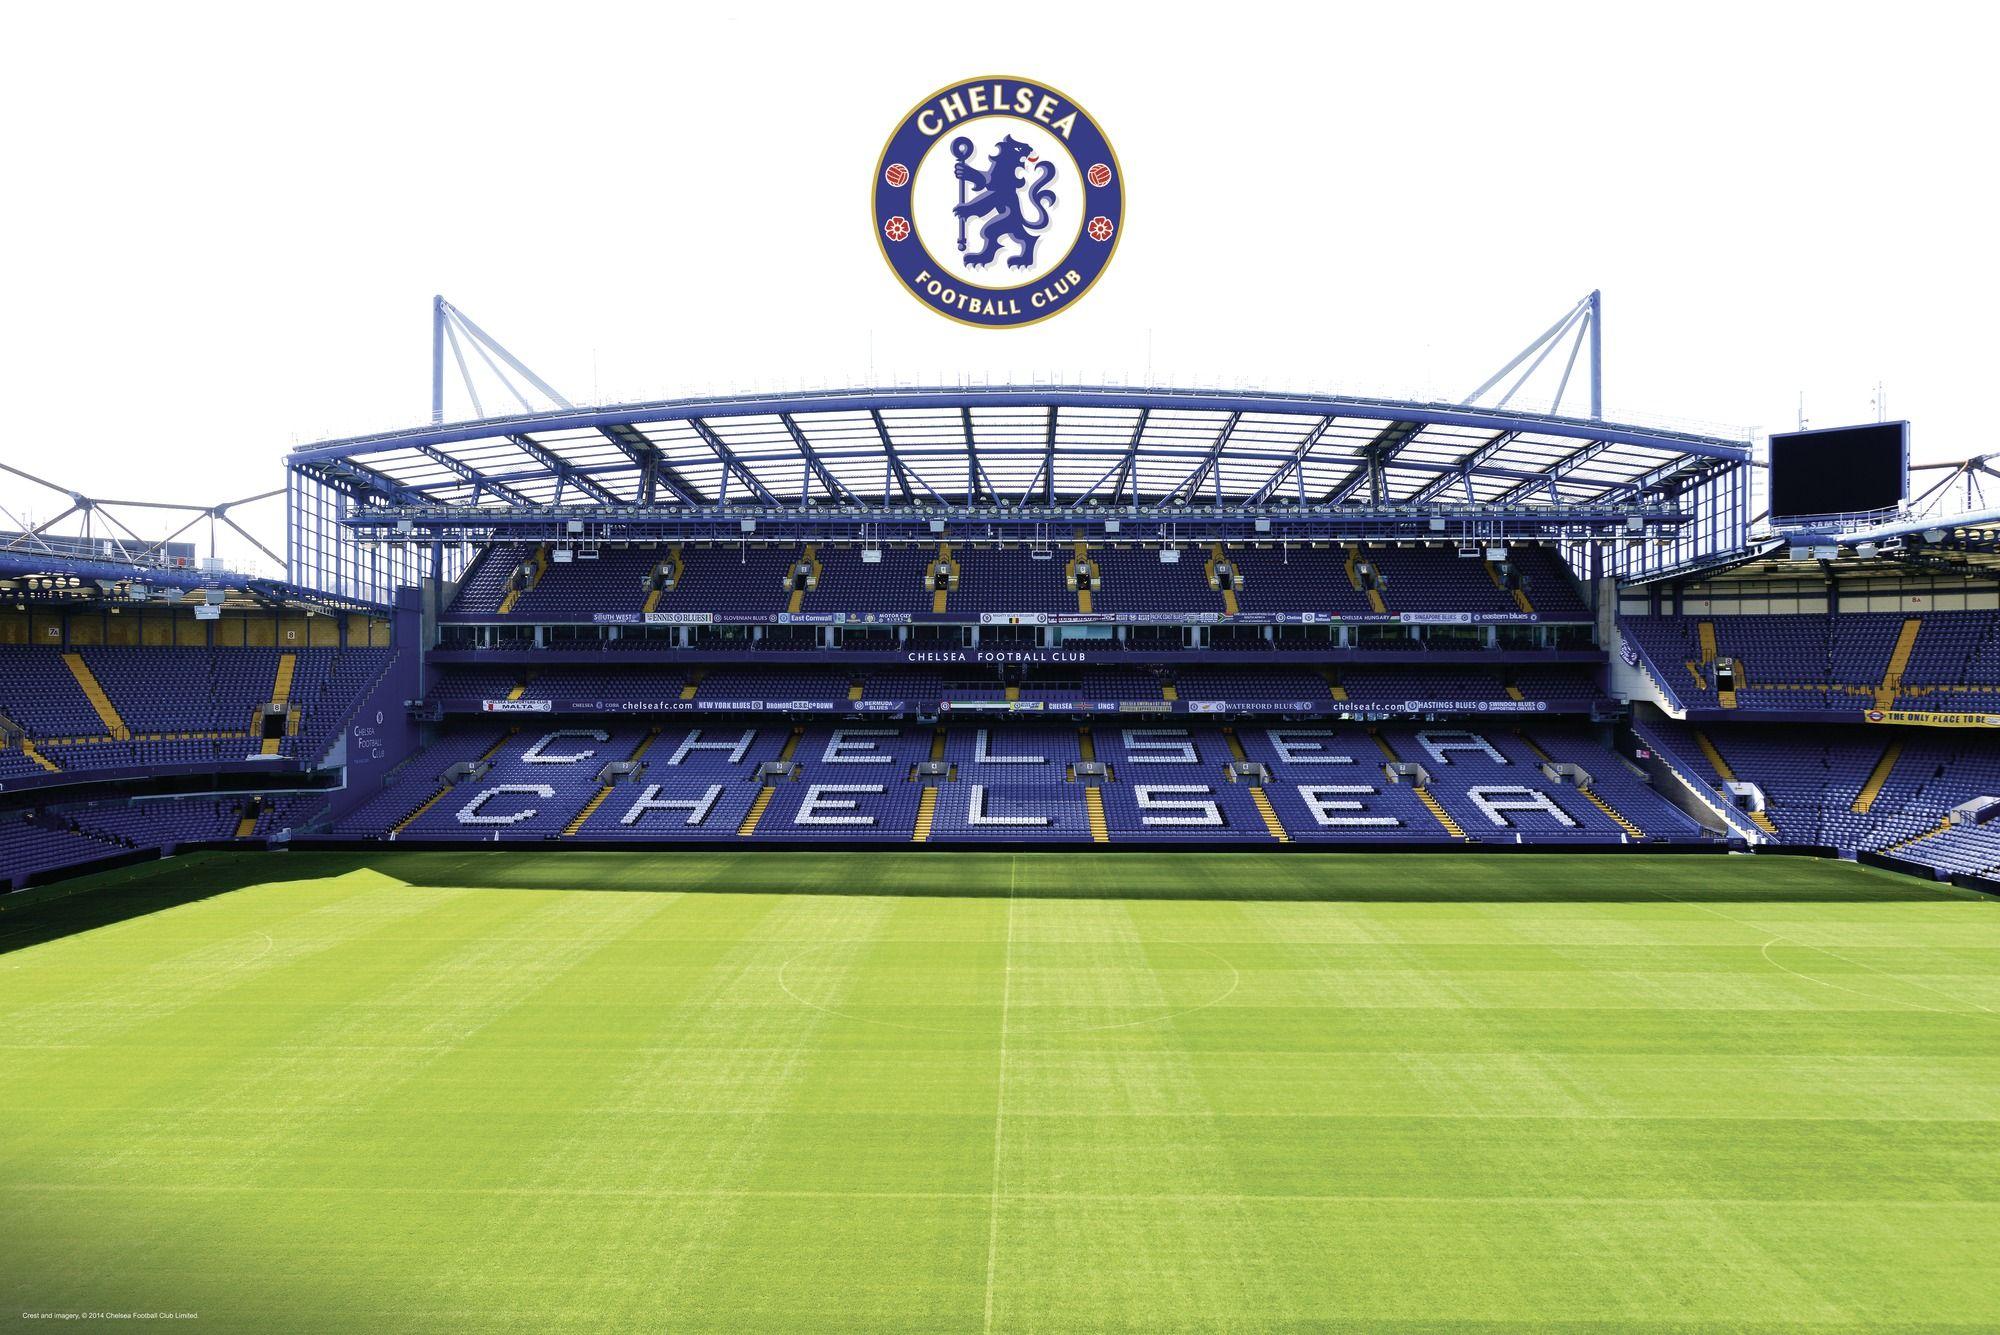 Stamford Bridge Fulham Road, London SW6 1HS